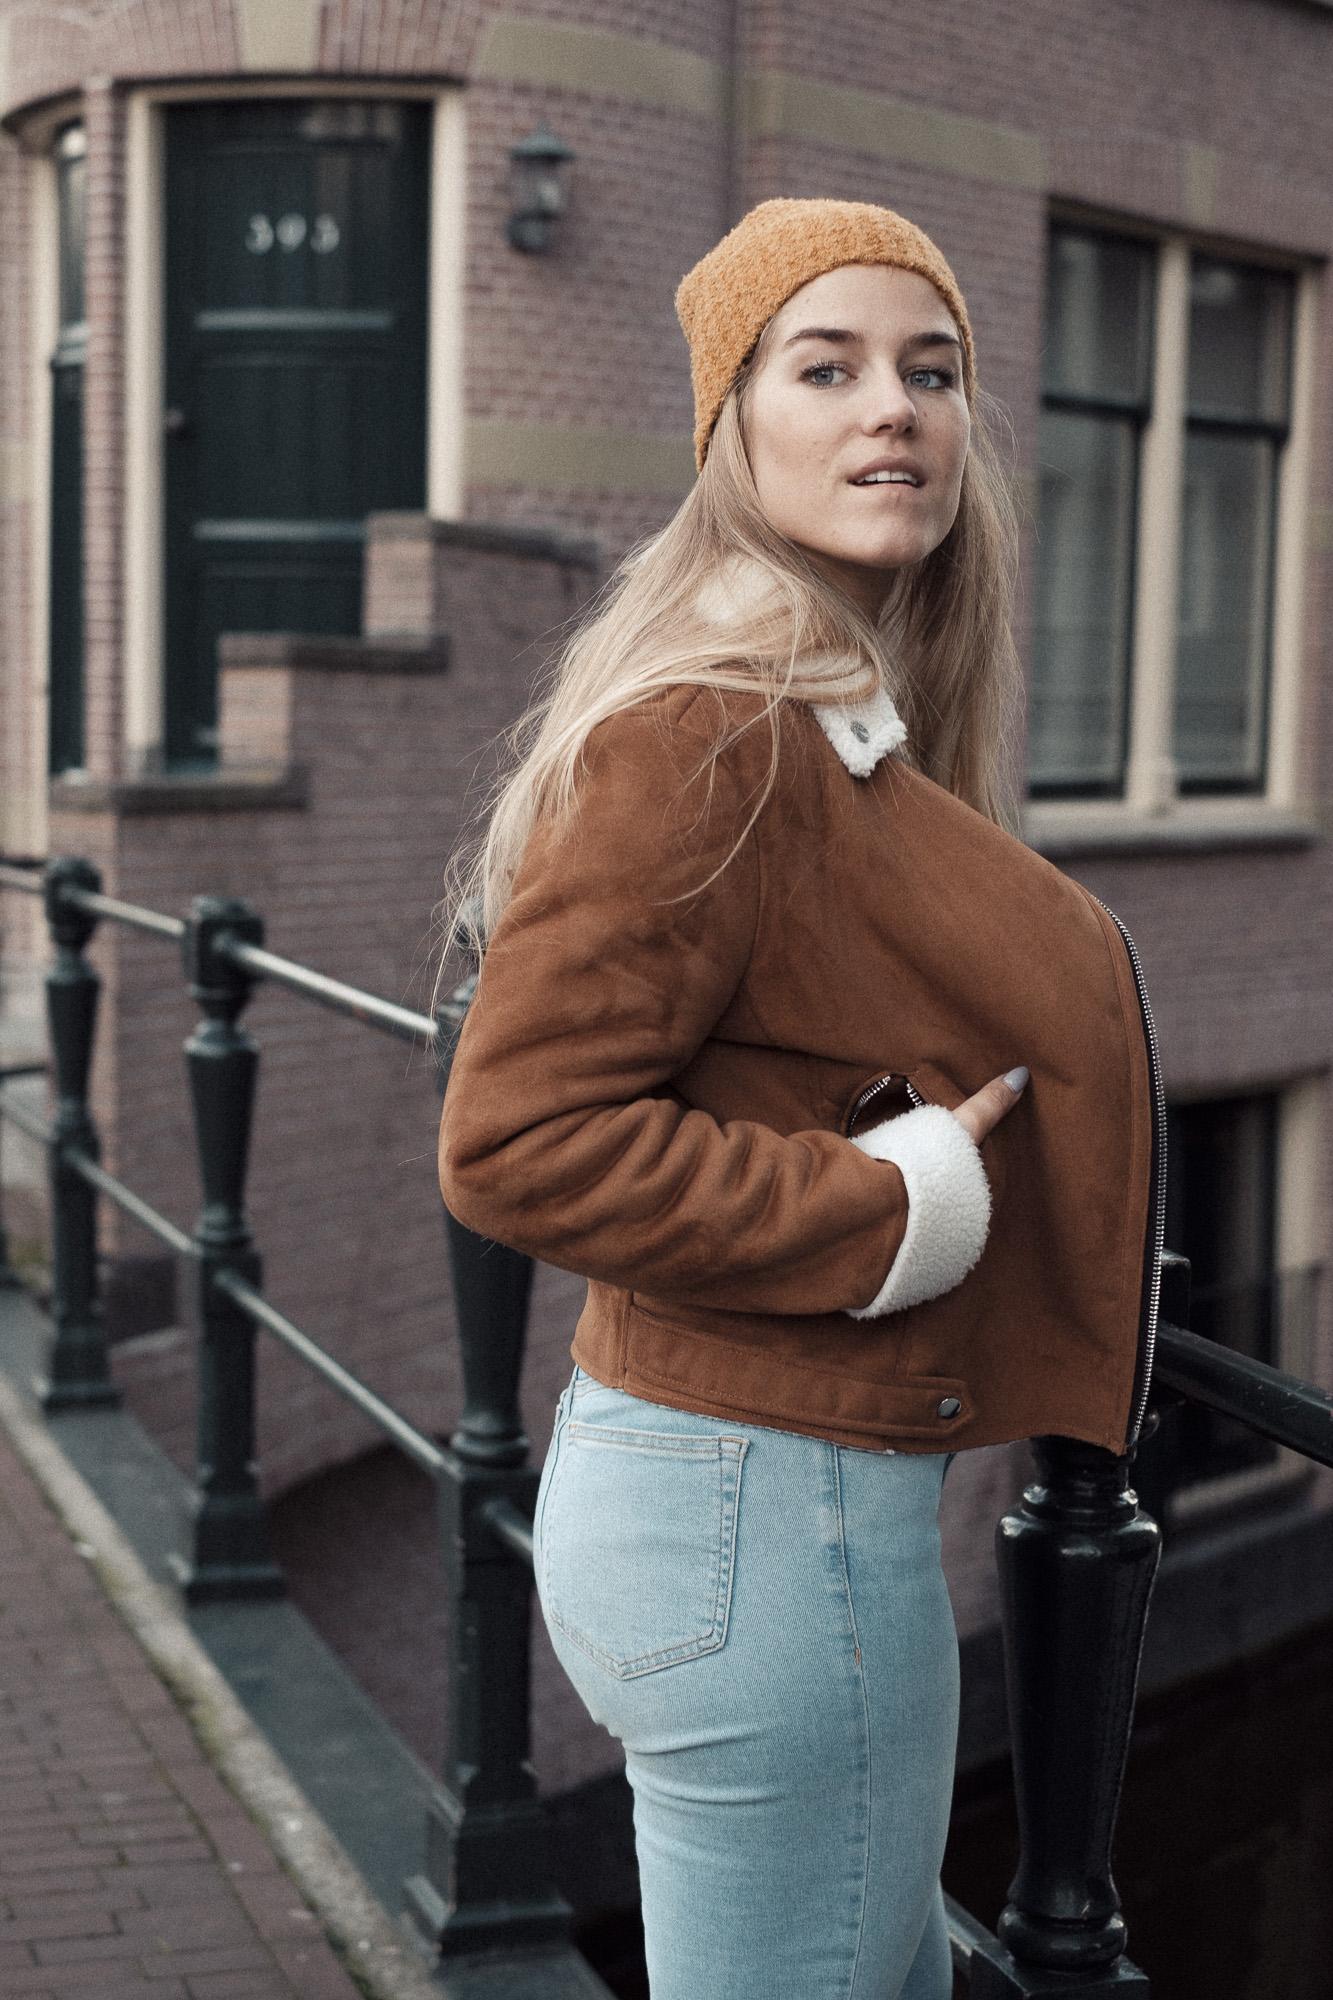 20190224 Amsterdam-386.jpg